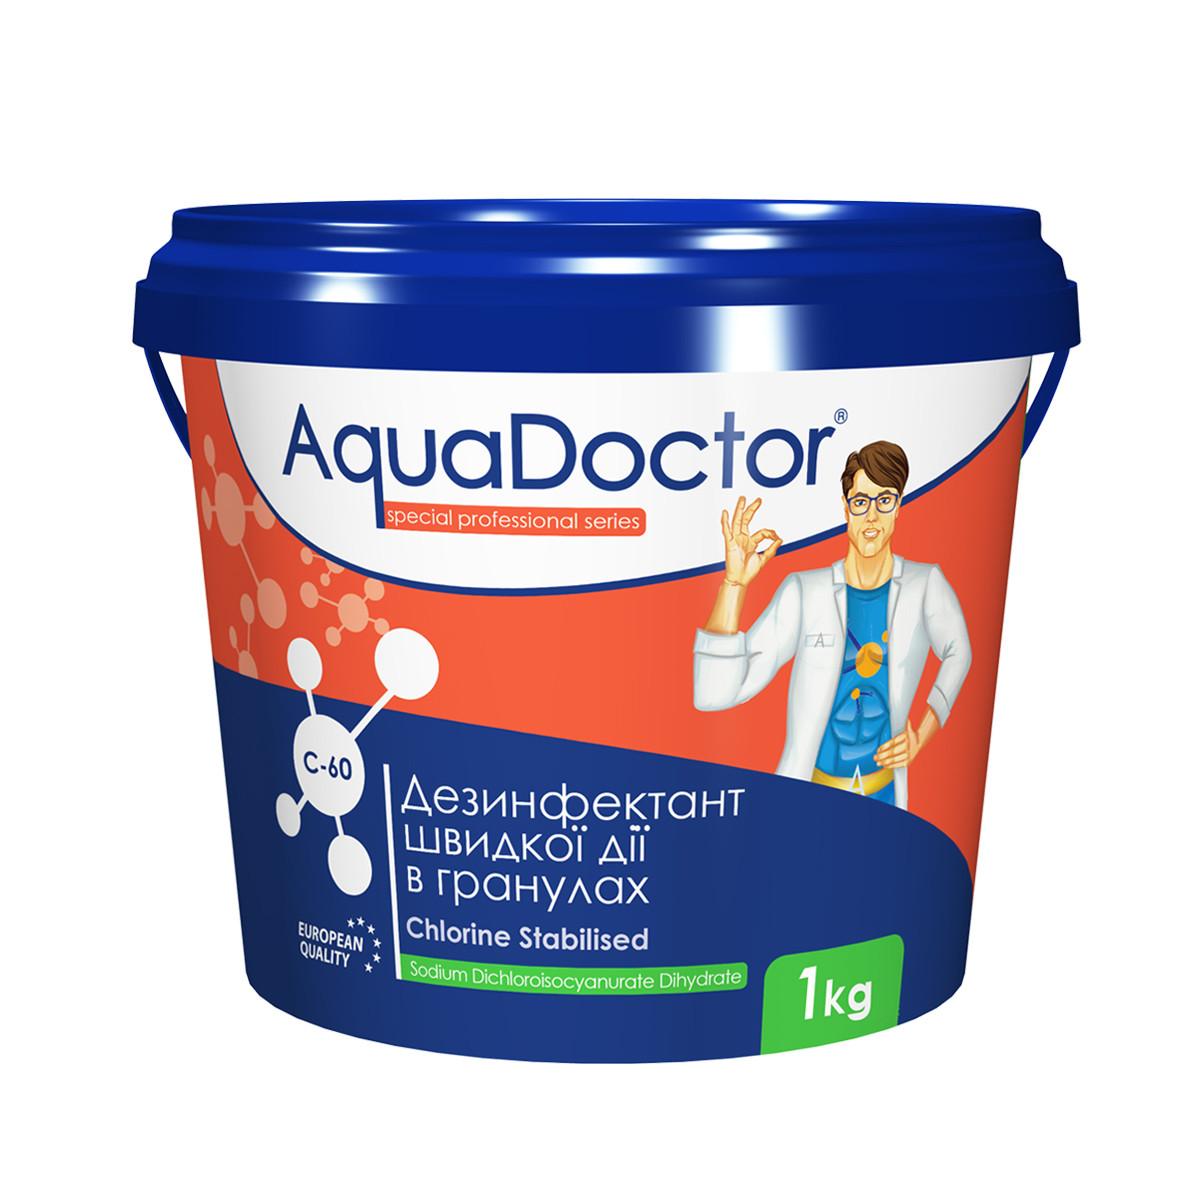 AquaDoctor C-60 (1 кг) ГРАНУЛЫ. Шок хлор, быстрый хлор. Химия для бассейнов